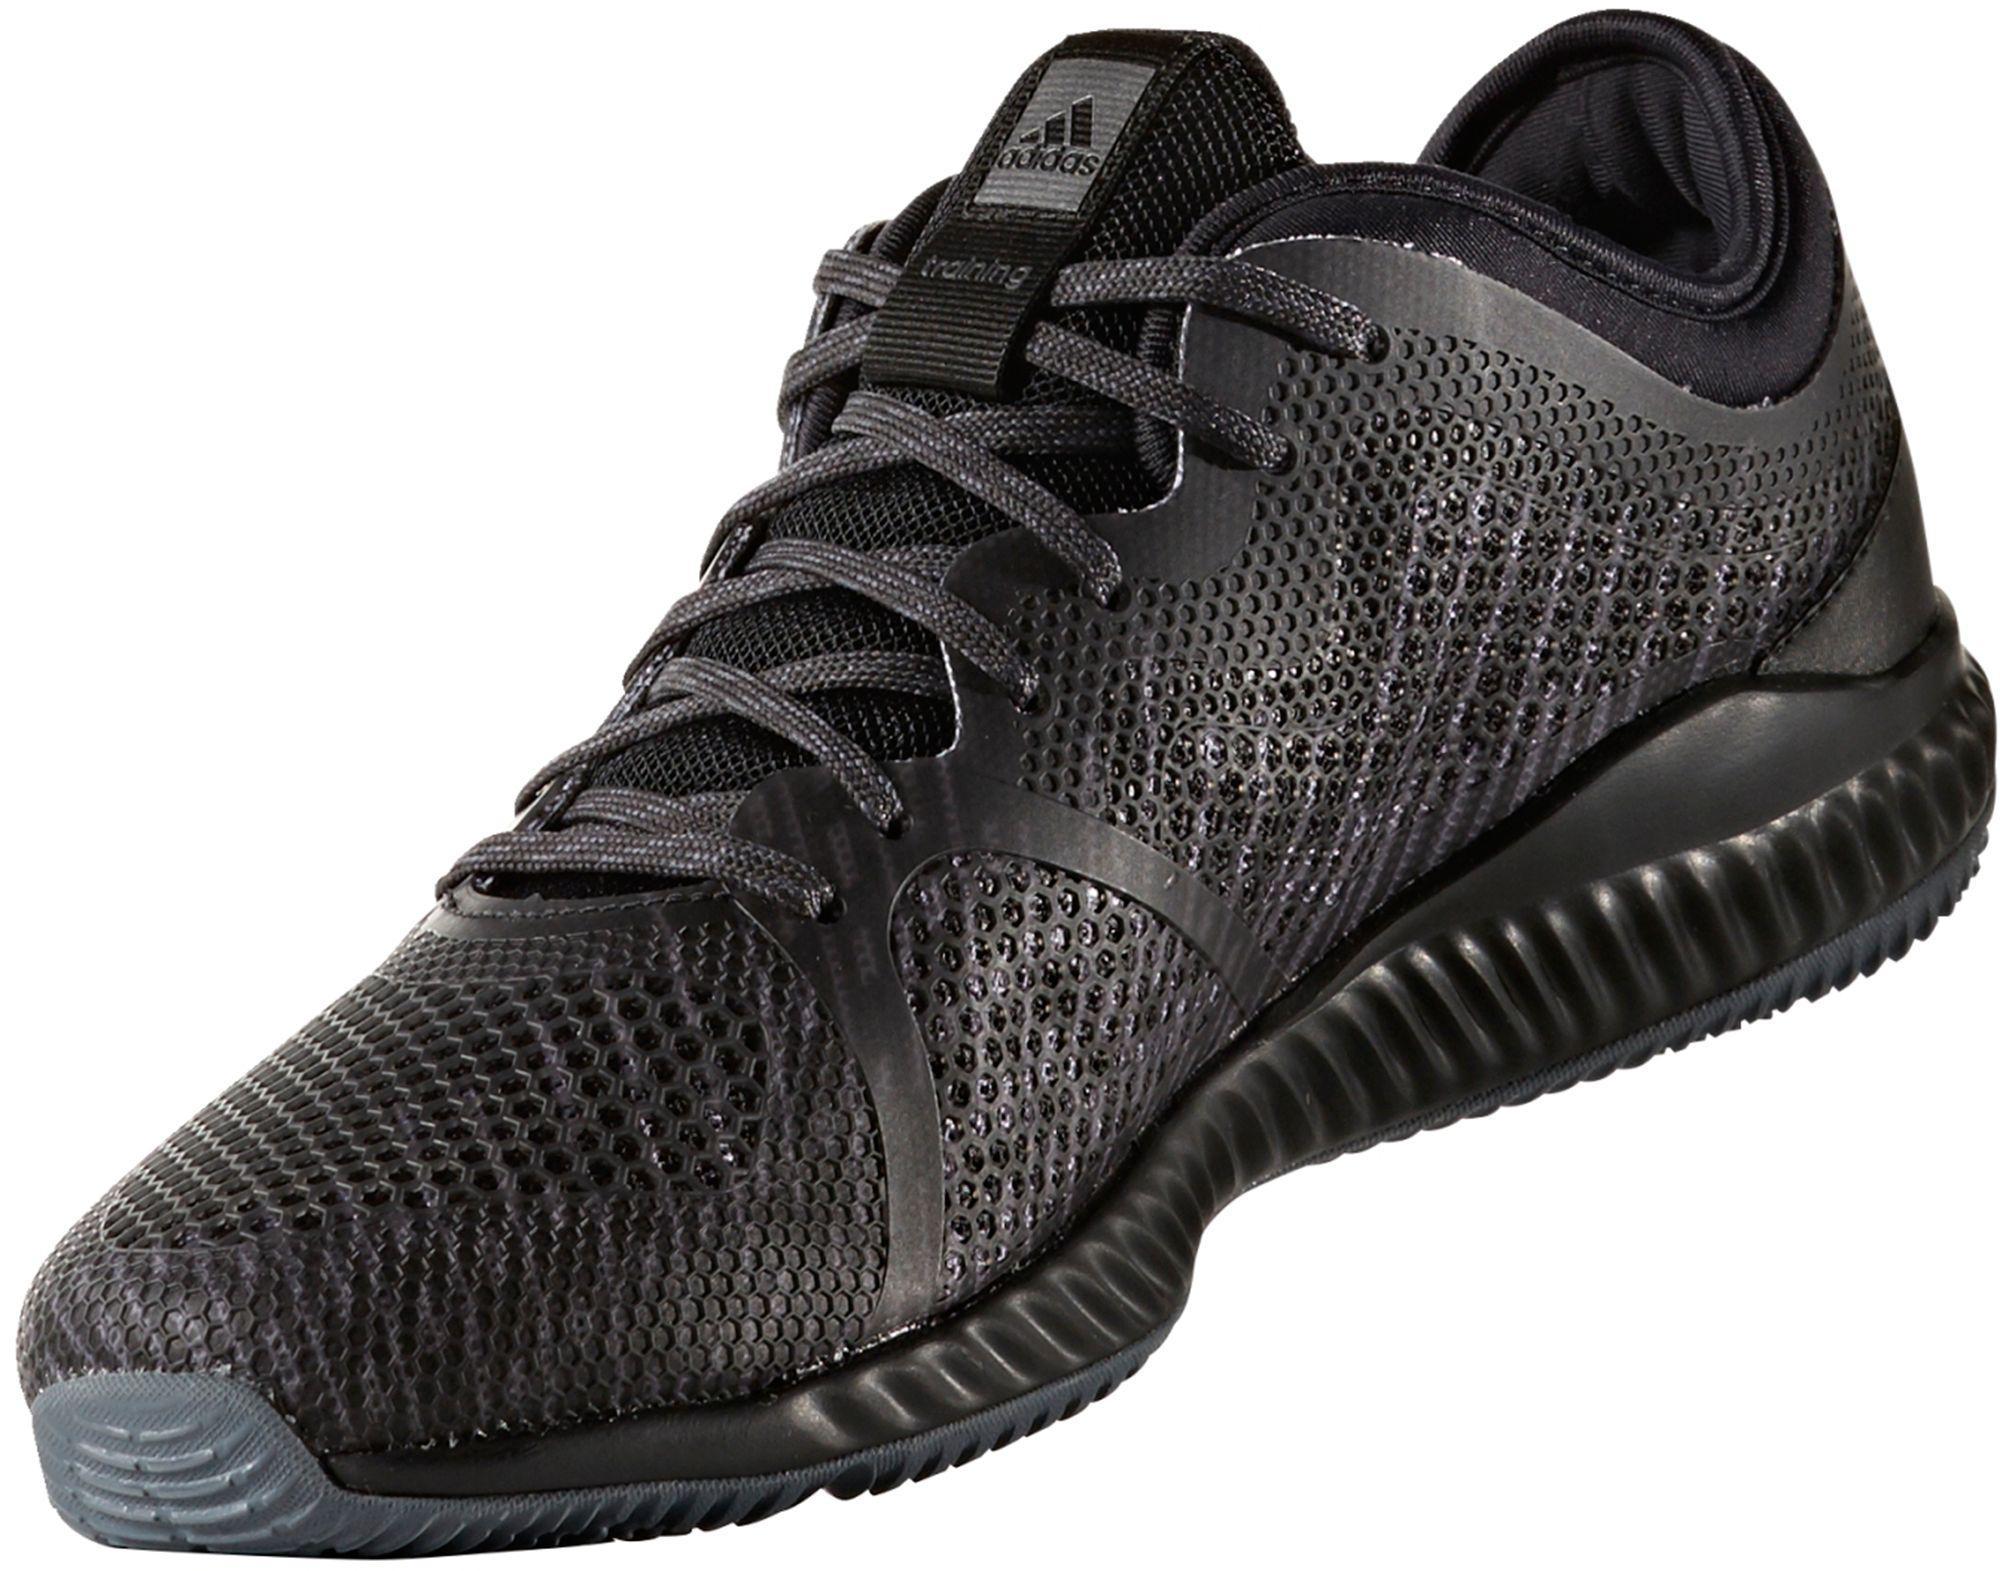 timeless design ca3a8 96d09 Adidas - Black Crazytrain Pro Shoes - Lyst